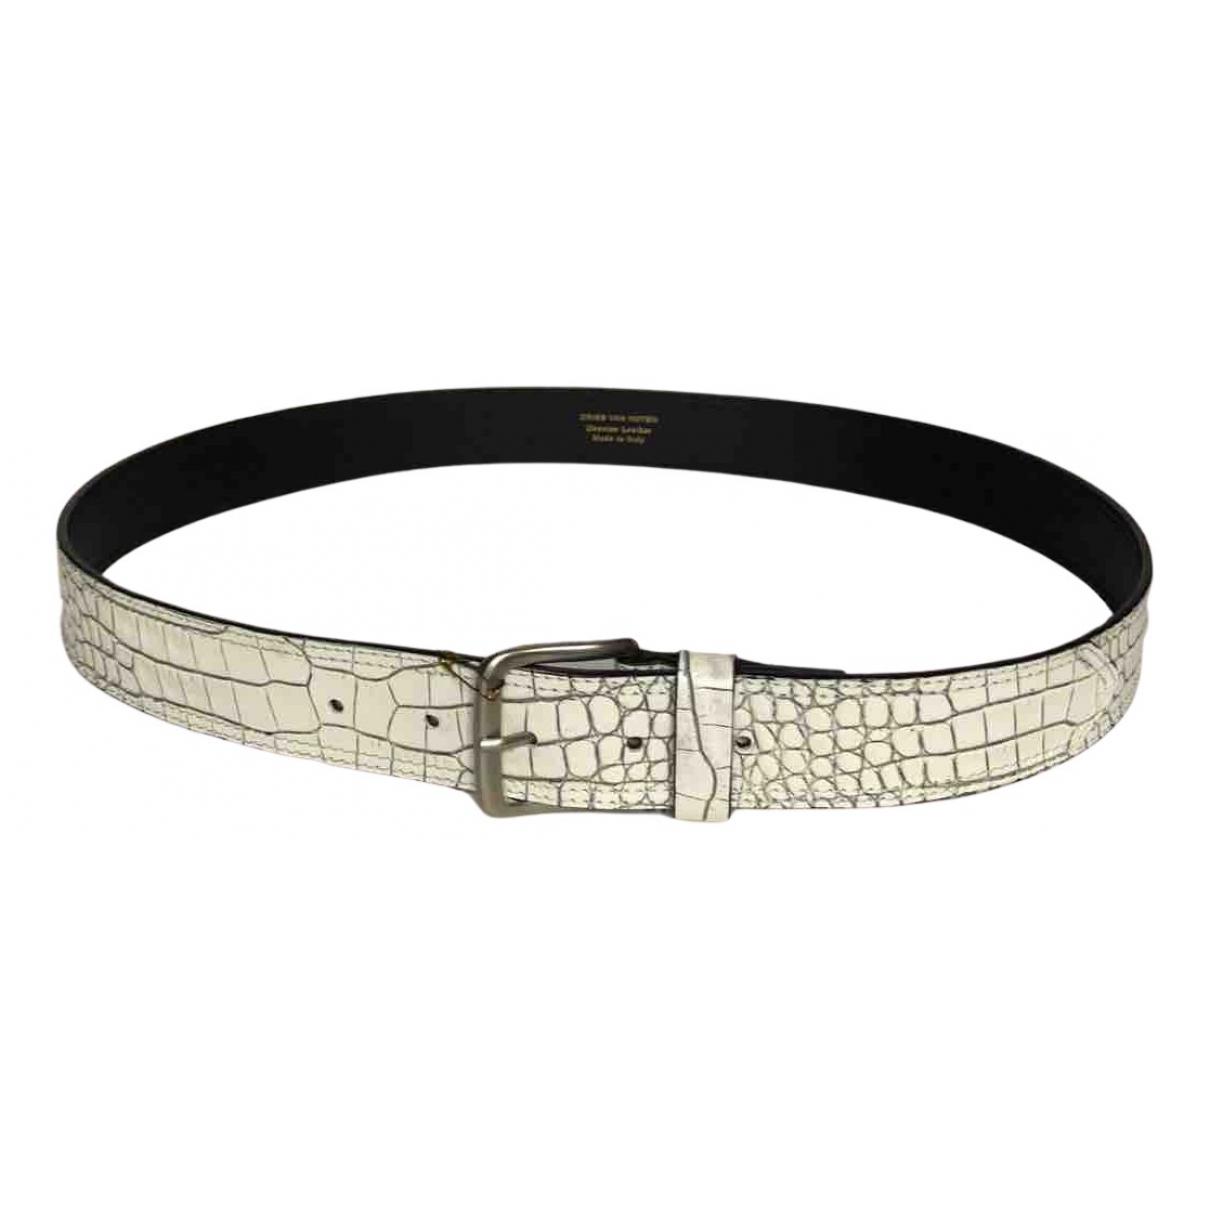 Dries Van Noten N White Leather belt for Men 90 cm